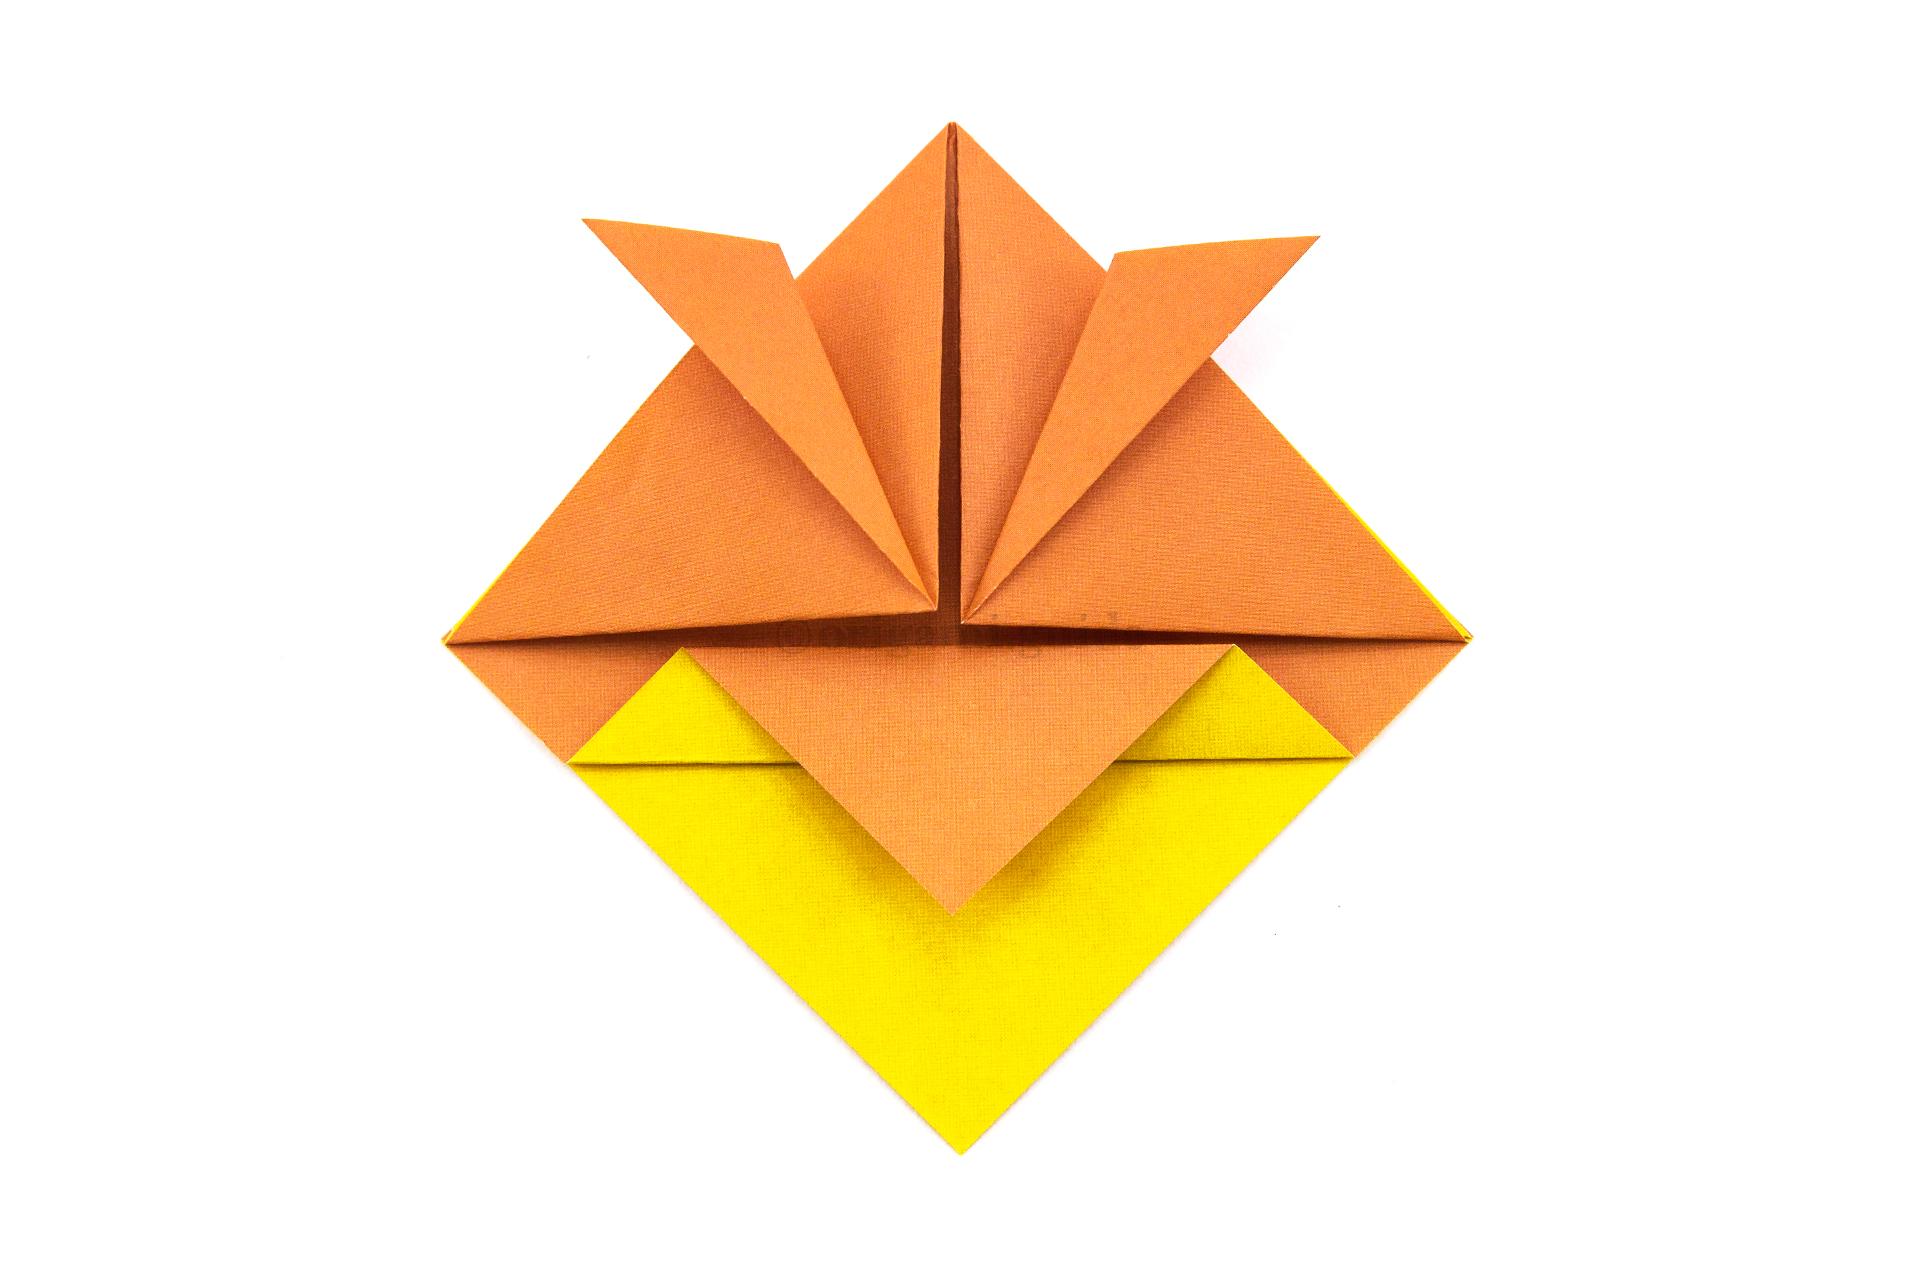 3d Origami Top hat Purple Penguin by Merleus on DeviantArt | 1280x1920